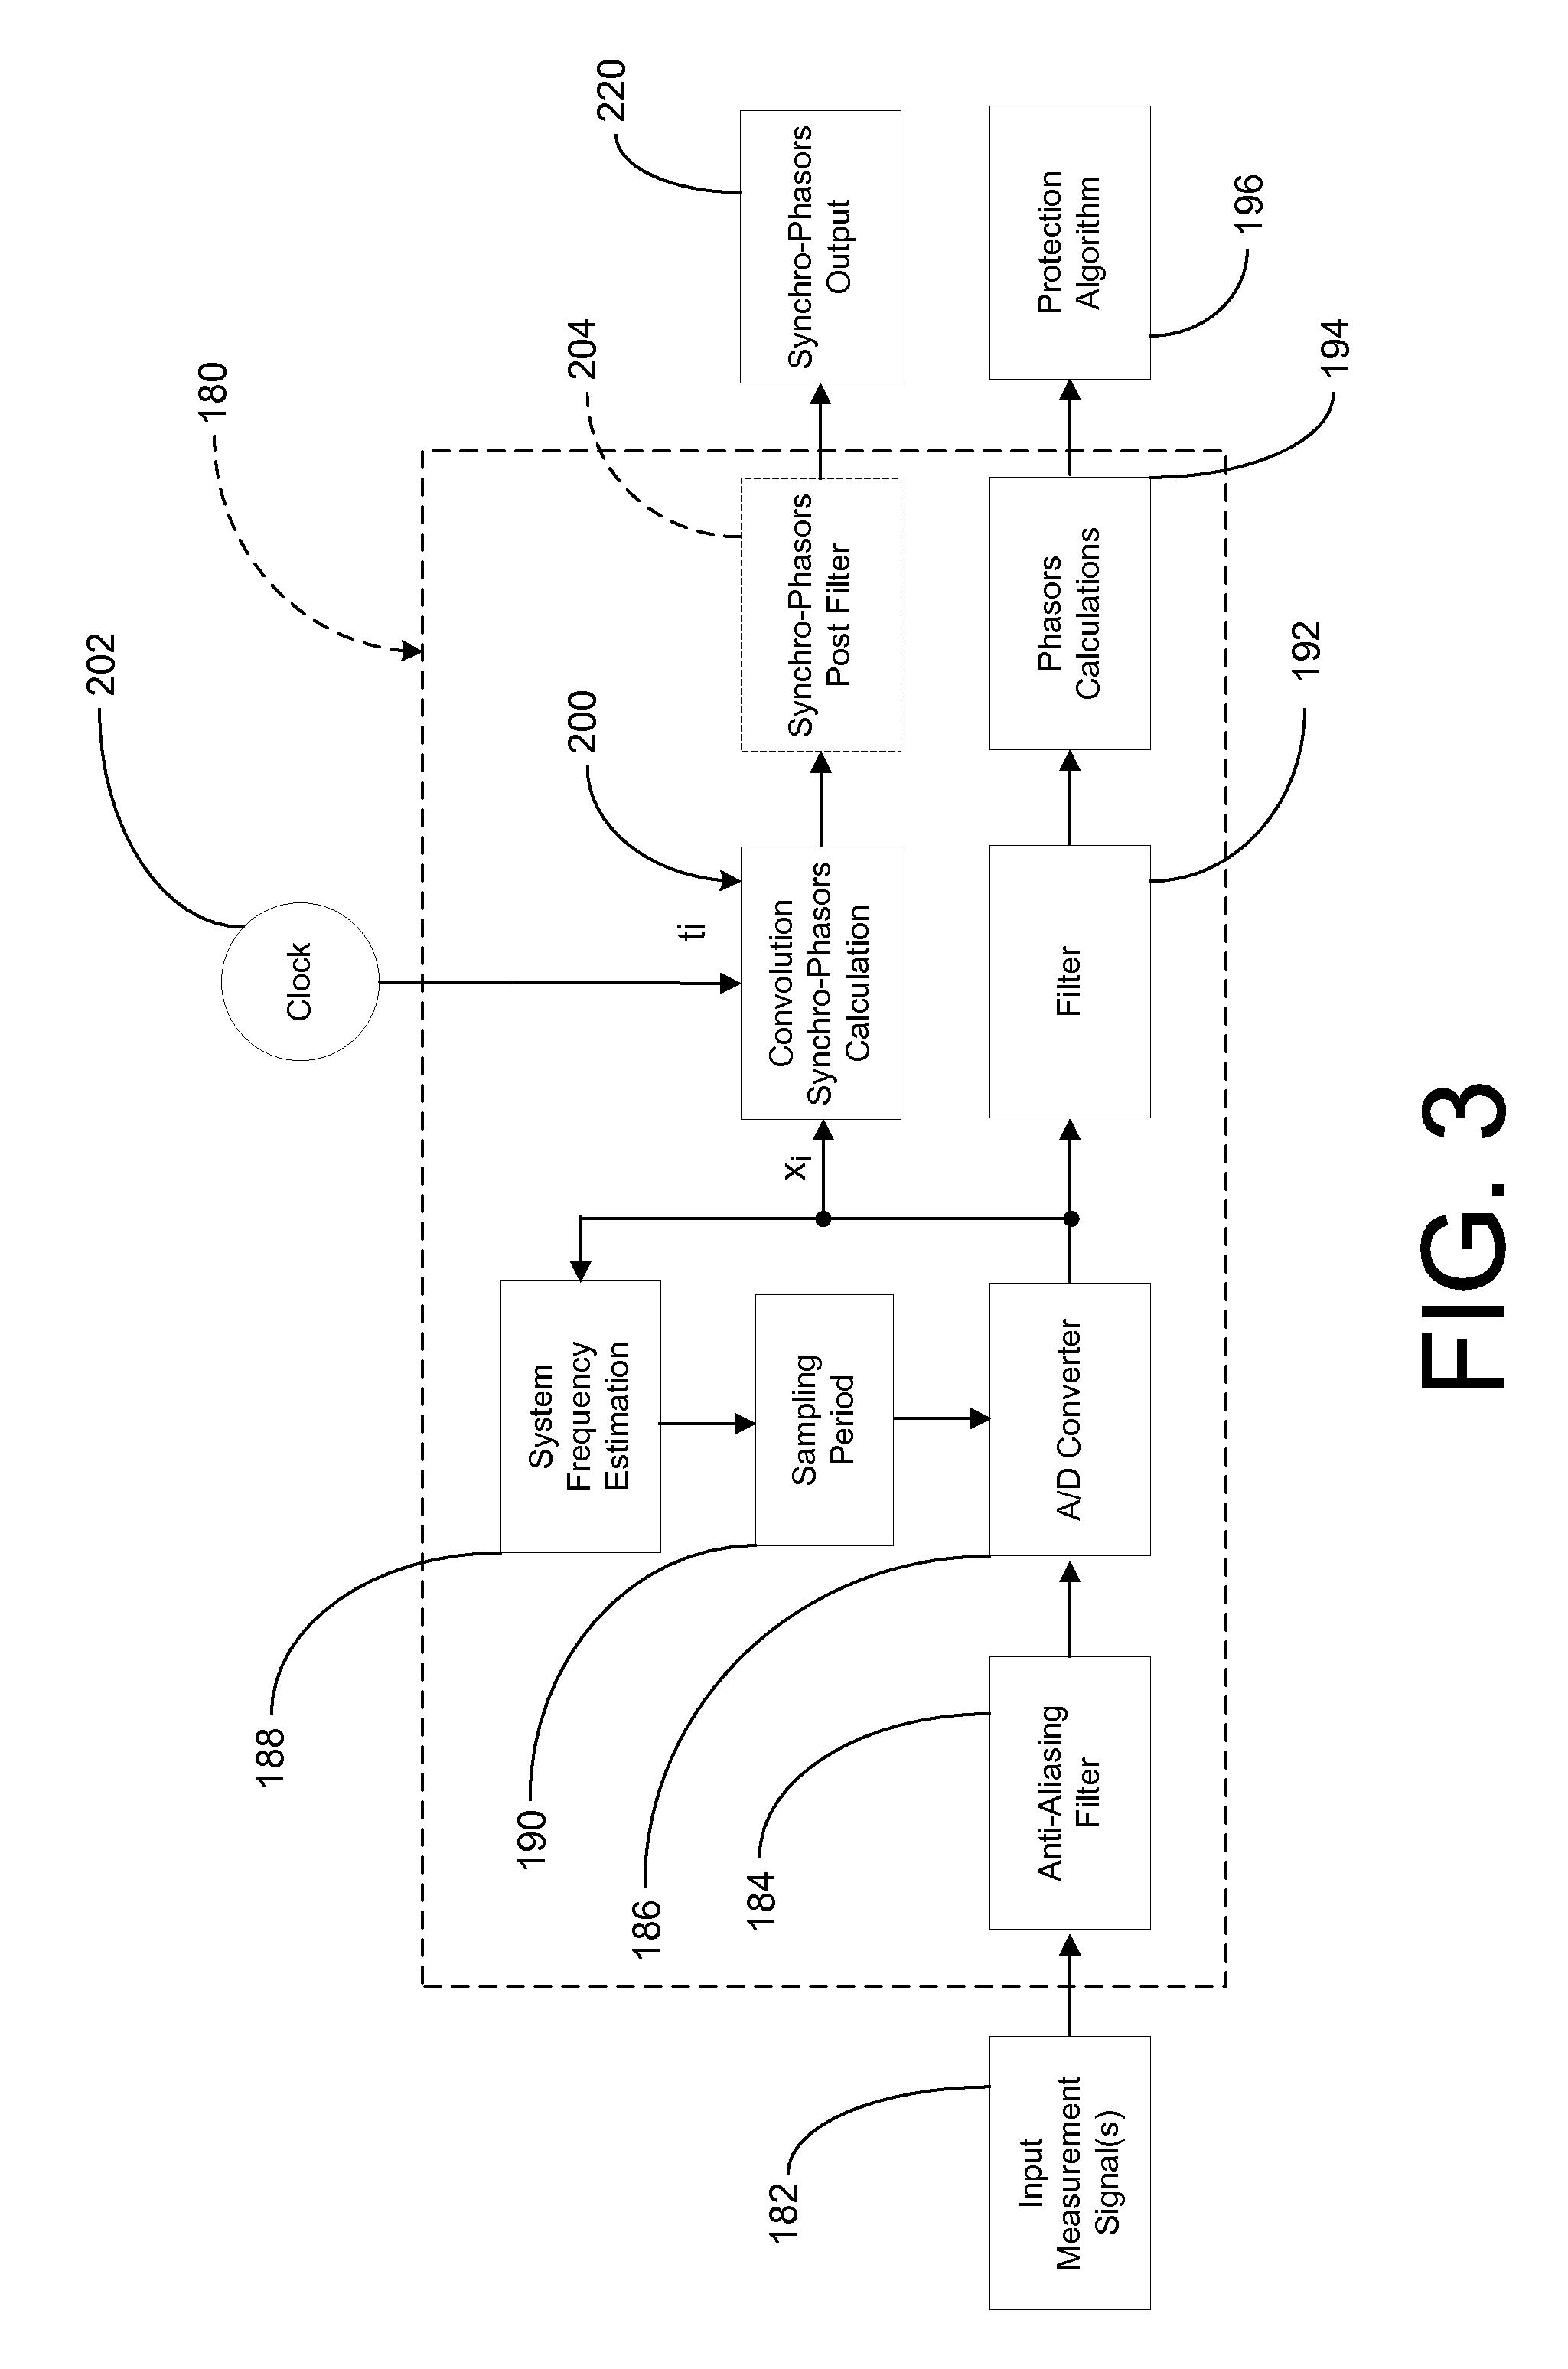 Draw Phasor Diagram Online Patent Convolution Integral For Synchronized